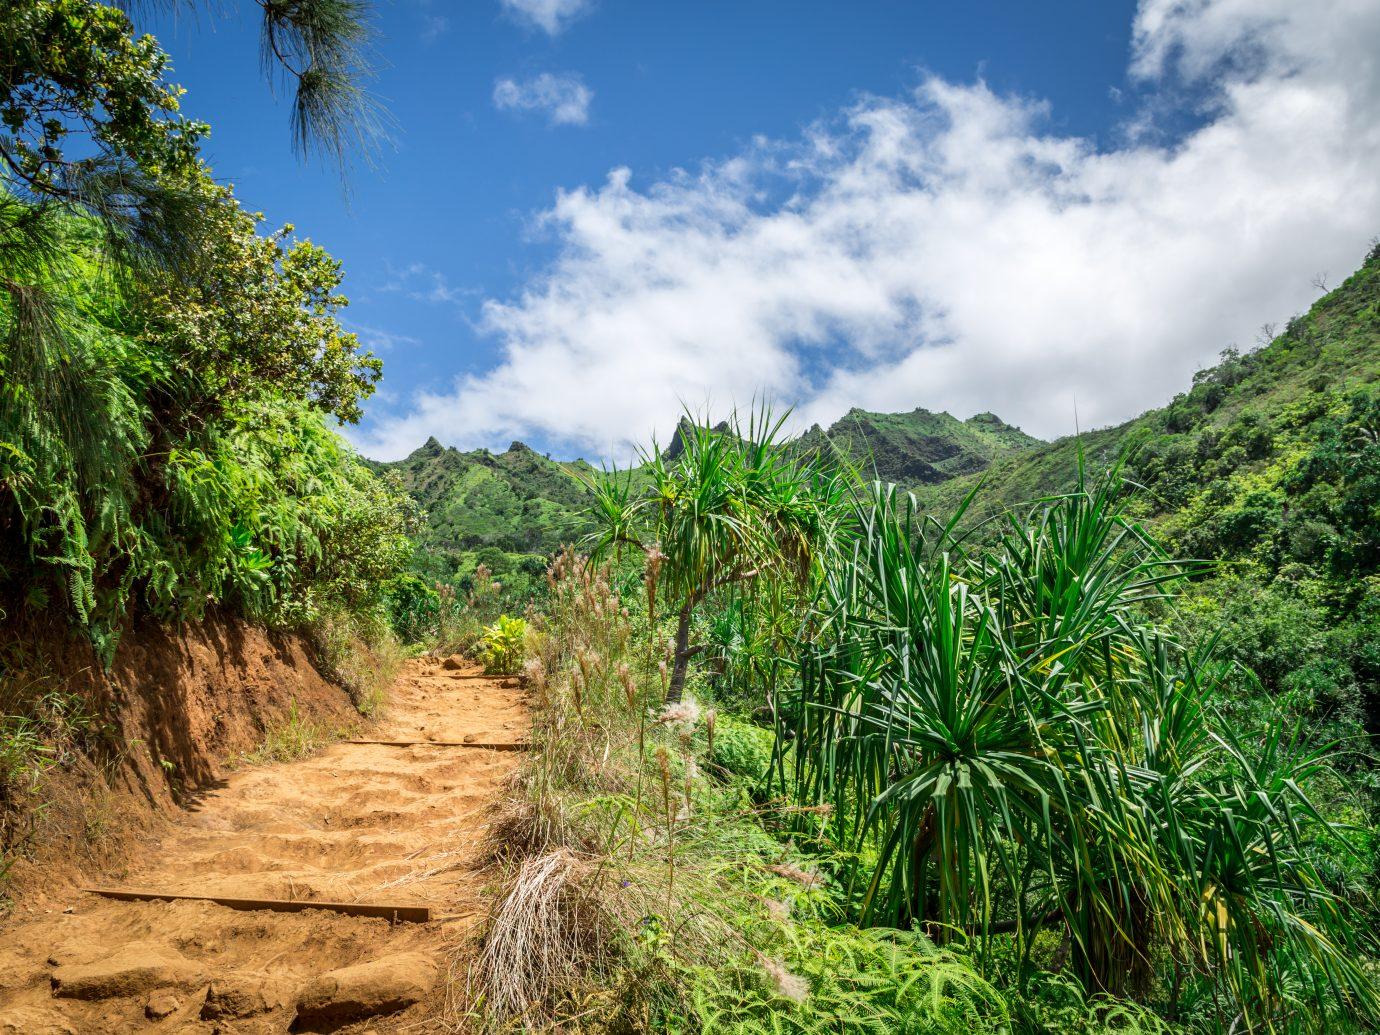 Kalalau Trail on the island of Kauai, Hawaii